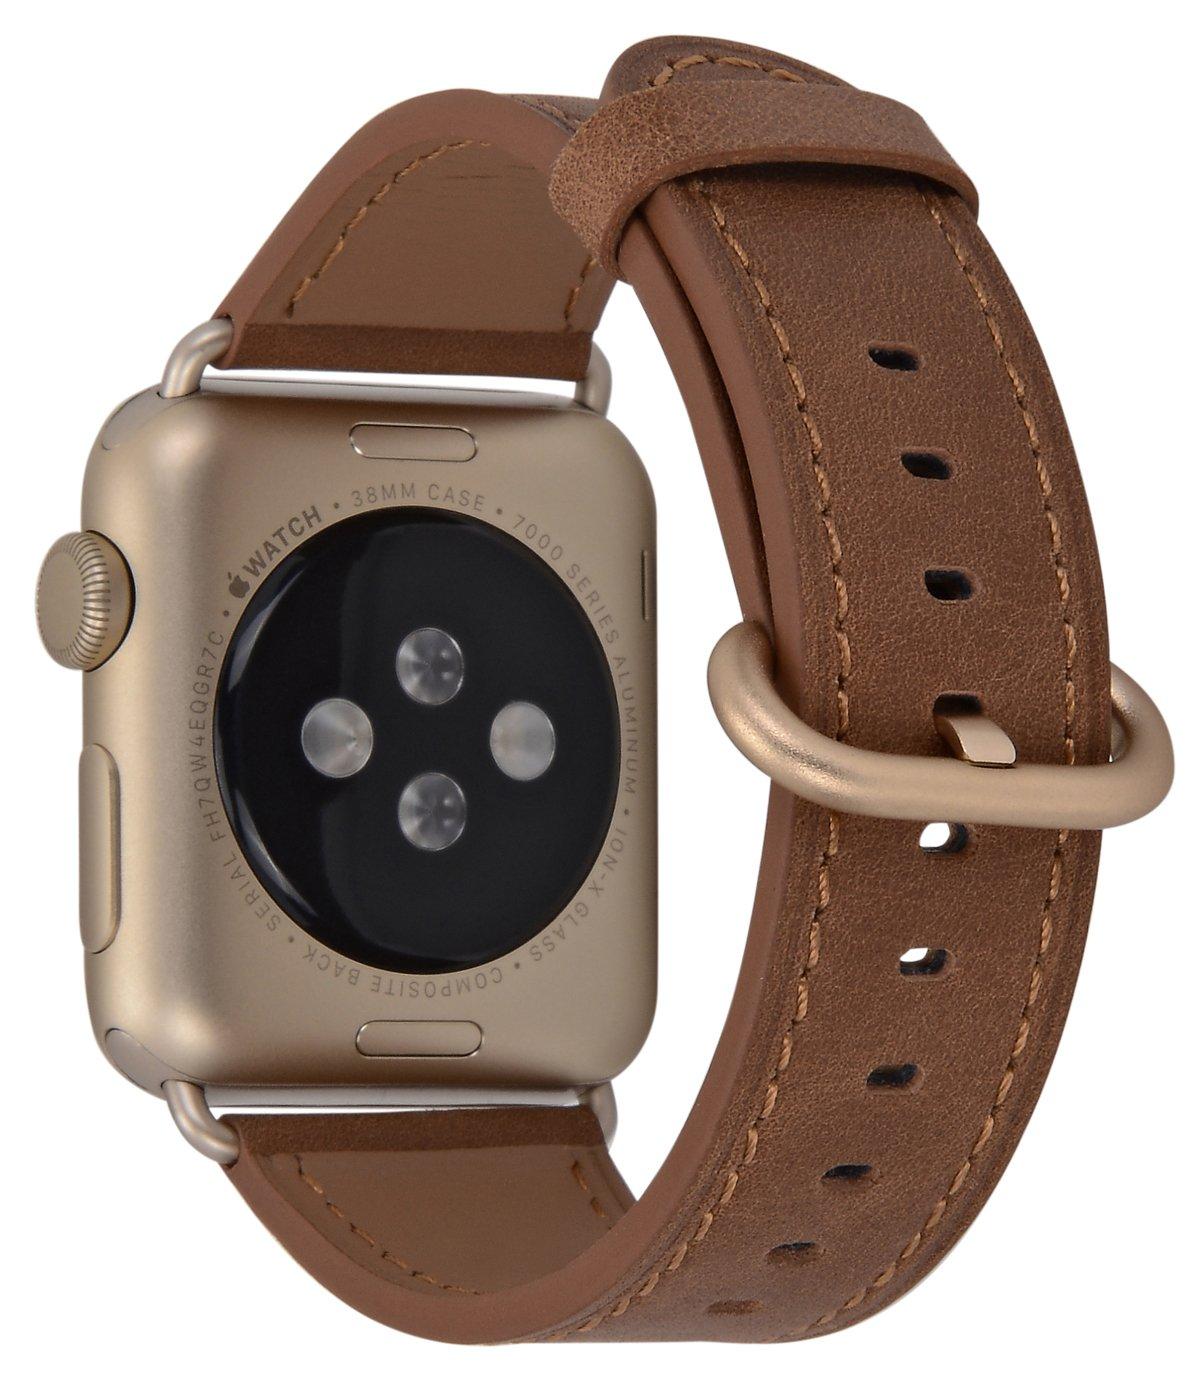 Malla Cuero para Apple Watch (42/44mm) PEAK ZHANG [7GFFGYL9]